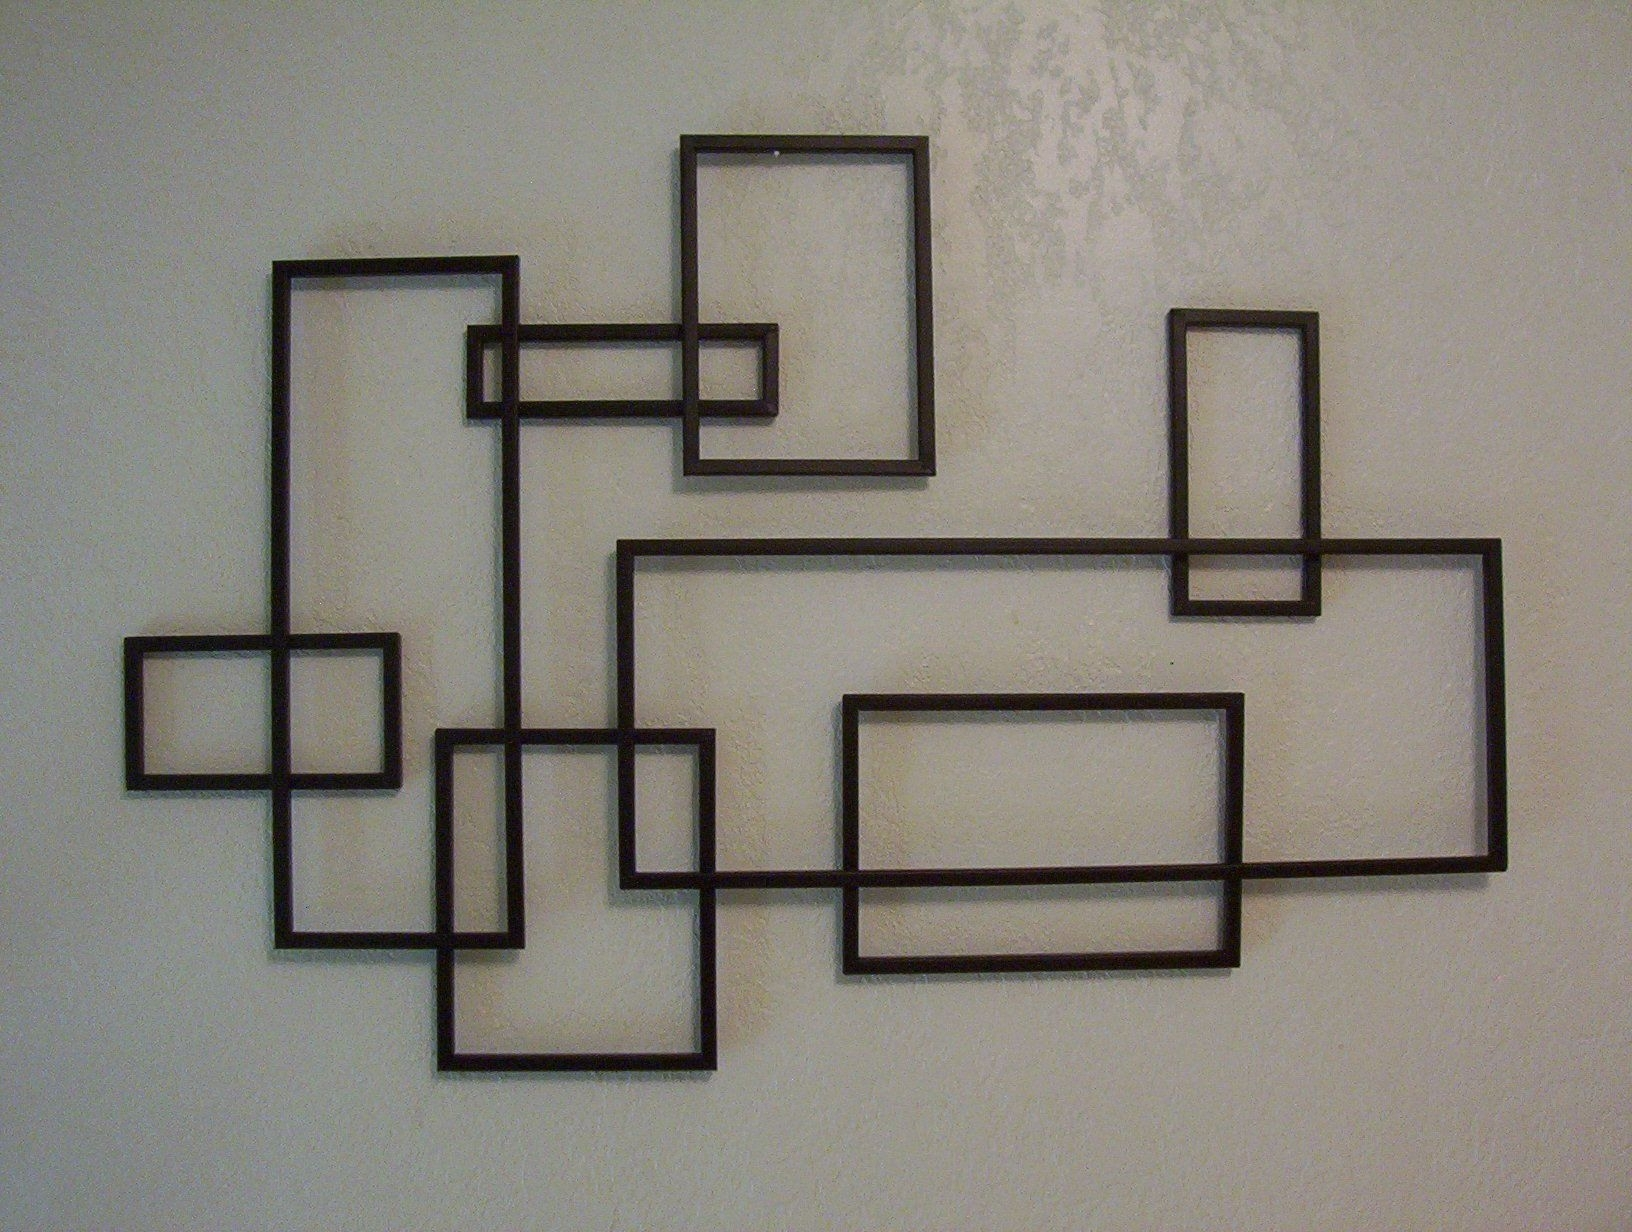 Mid Century Modern ~ De Stijl Style Geometric Metal Wall Sculpture Within Geometric Metal Wall Art (View 13 of 20)